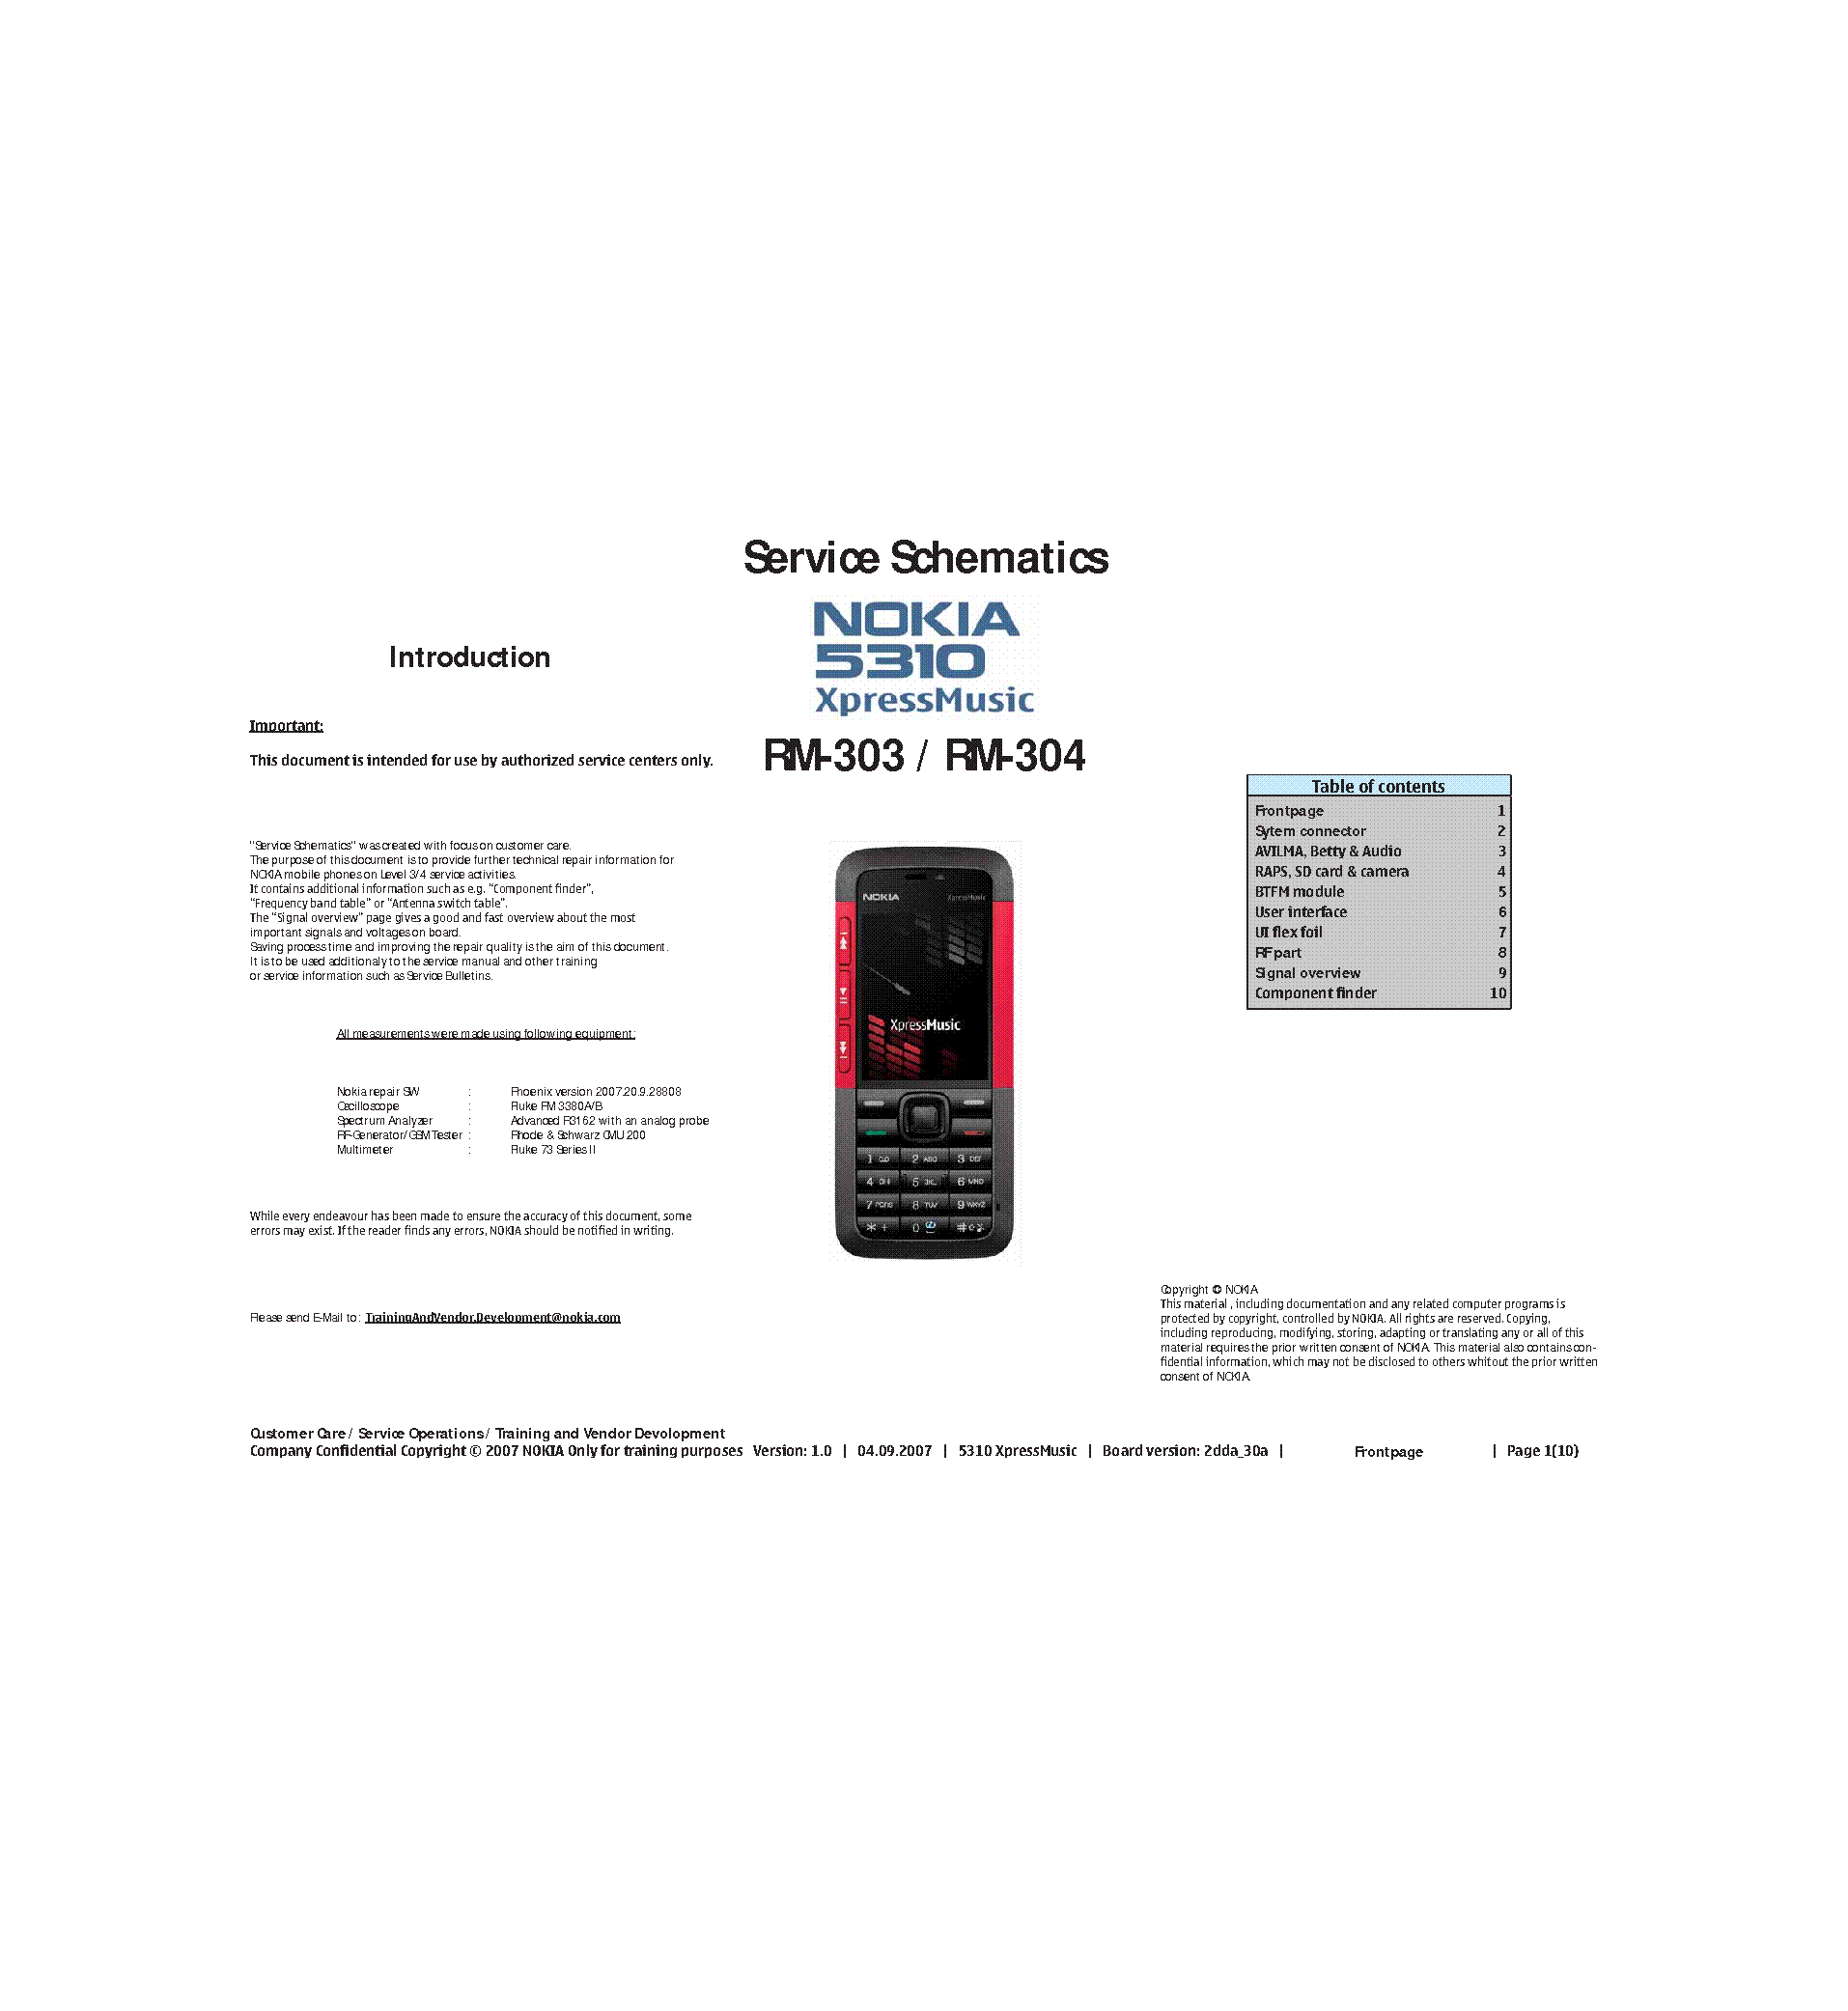 nokia 5310 xpressmusic rm 303 rm 304 schematics v1 0 zmod service rh elektrotanya com nokia 5310 service manual pdf Nokia 5330